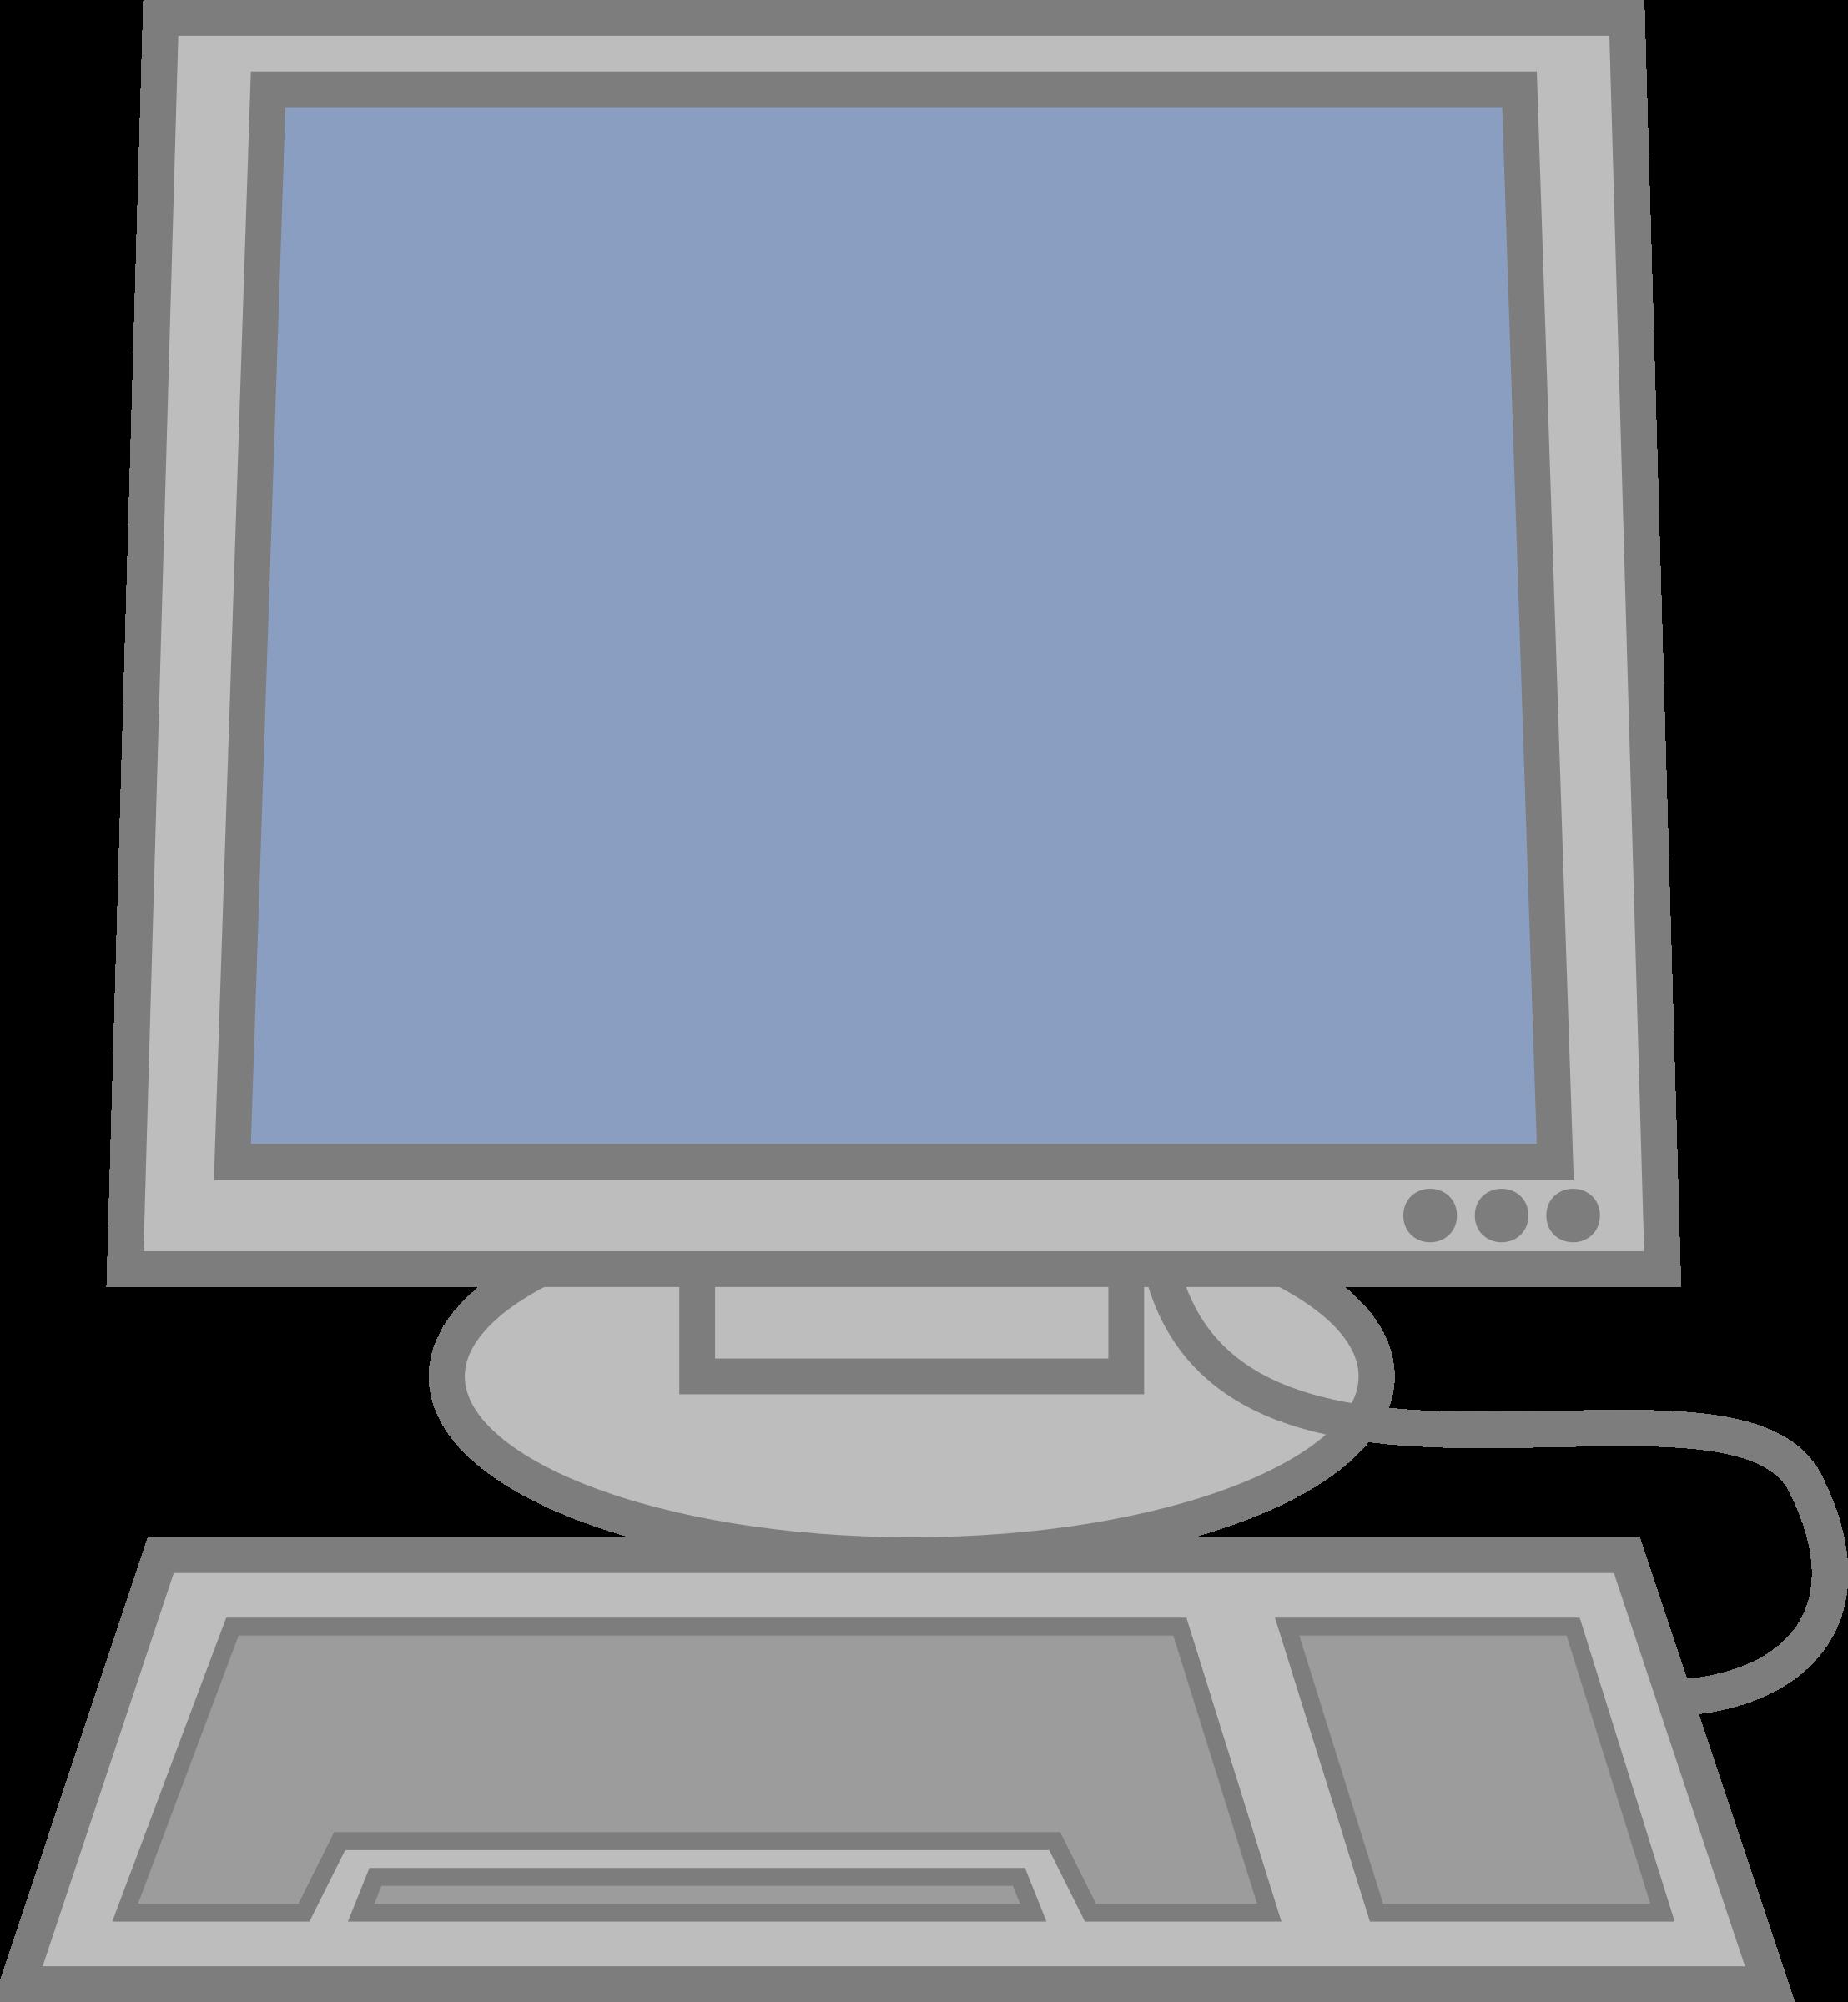 Computer clipart puter